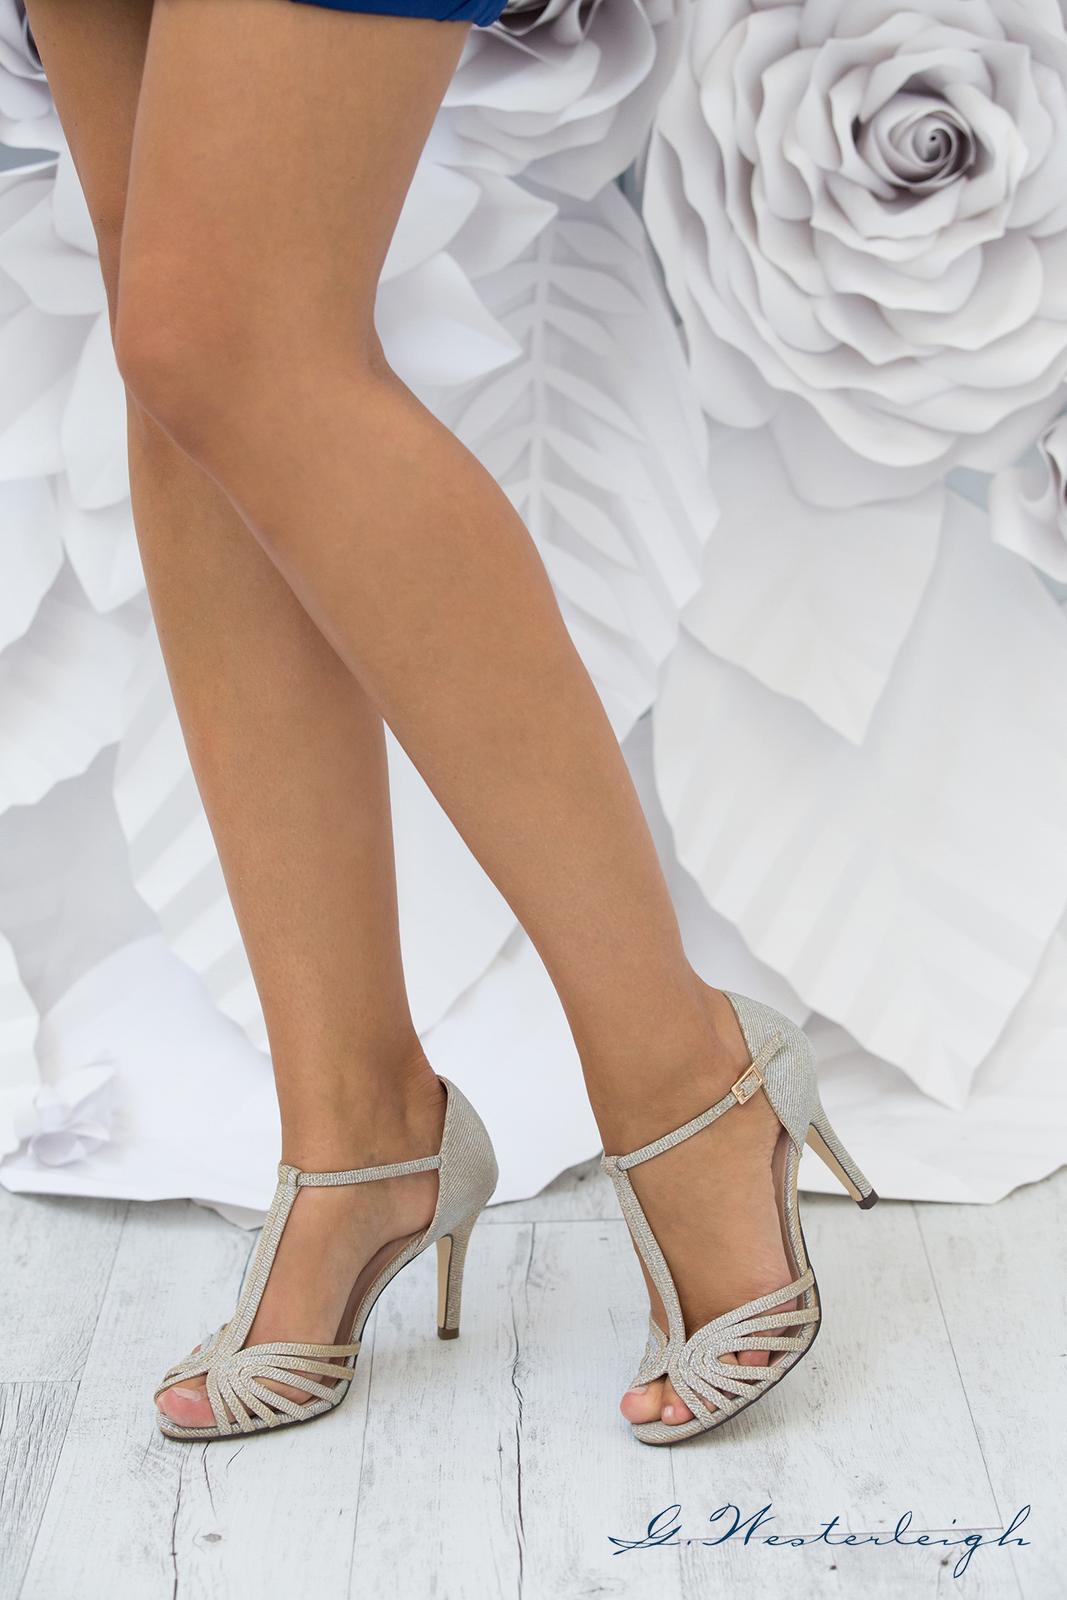 Spoločenské topánky Marbella - Obrázok č. 4